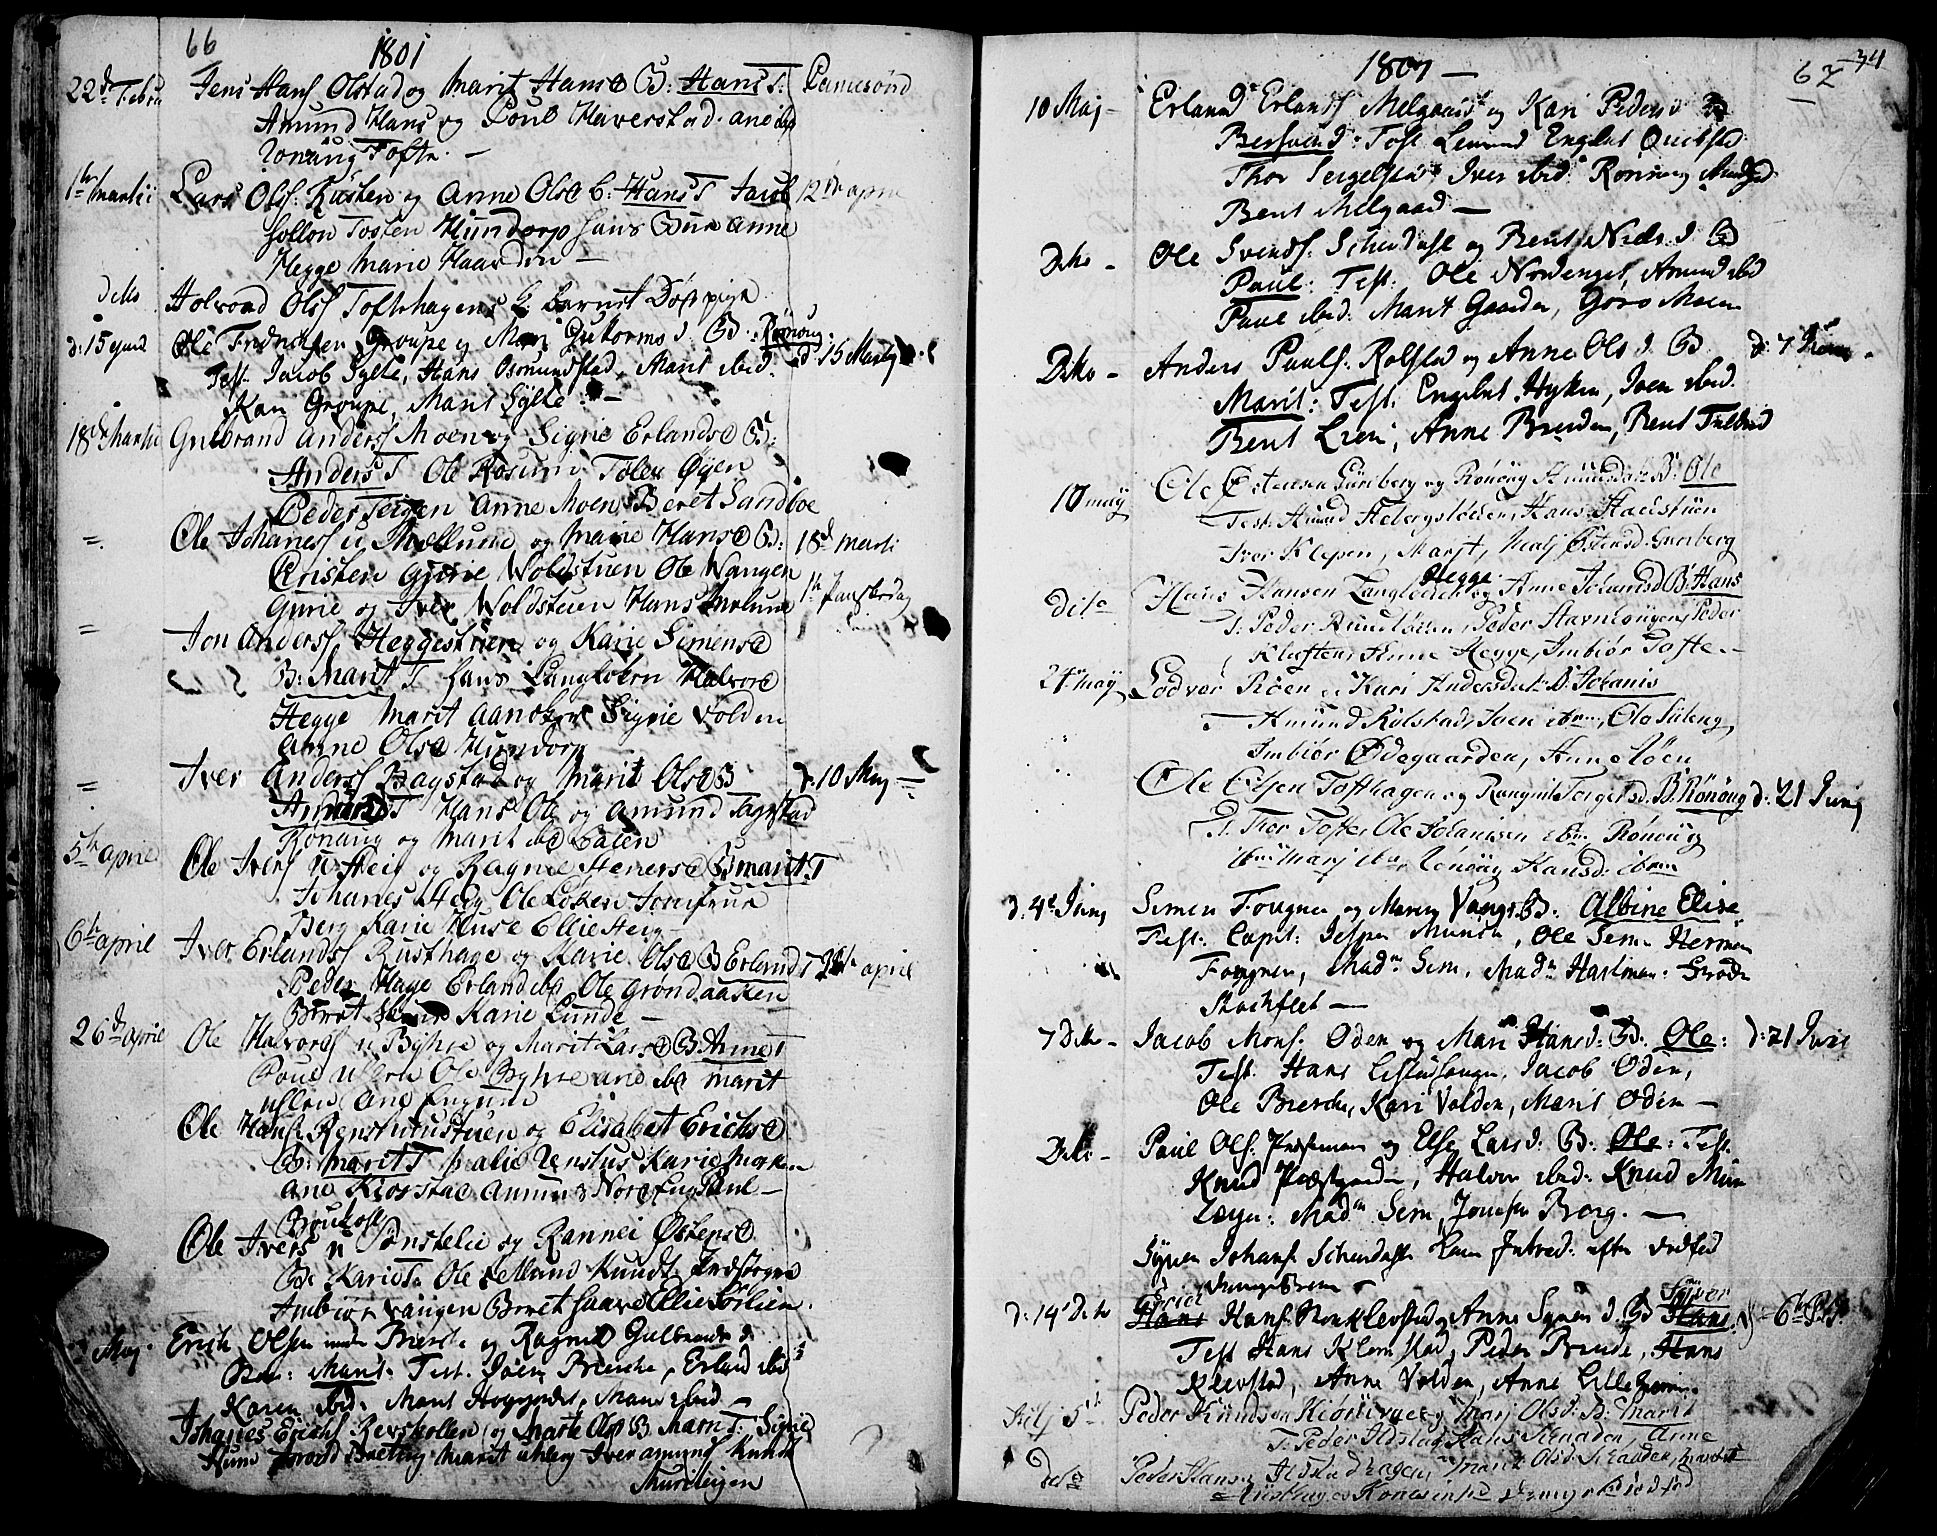 SAH, Fron prestekontor, H/Ha/Haa/L0001: Ministerialbok nr. 1, 1799-1816, s. 66-67